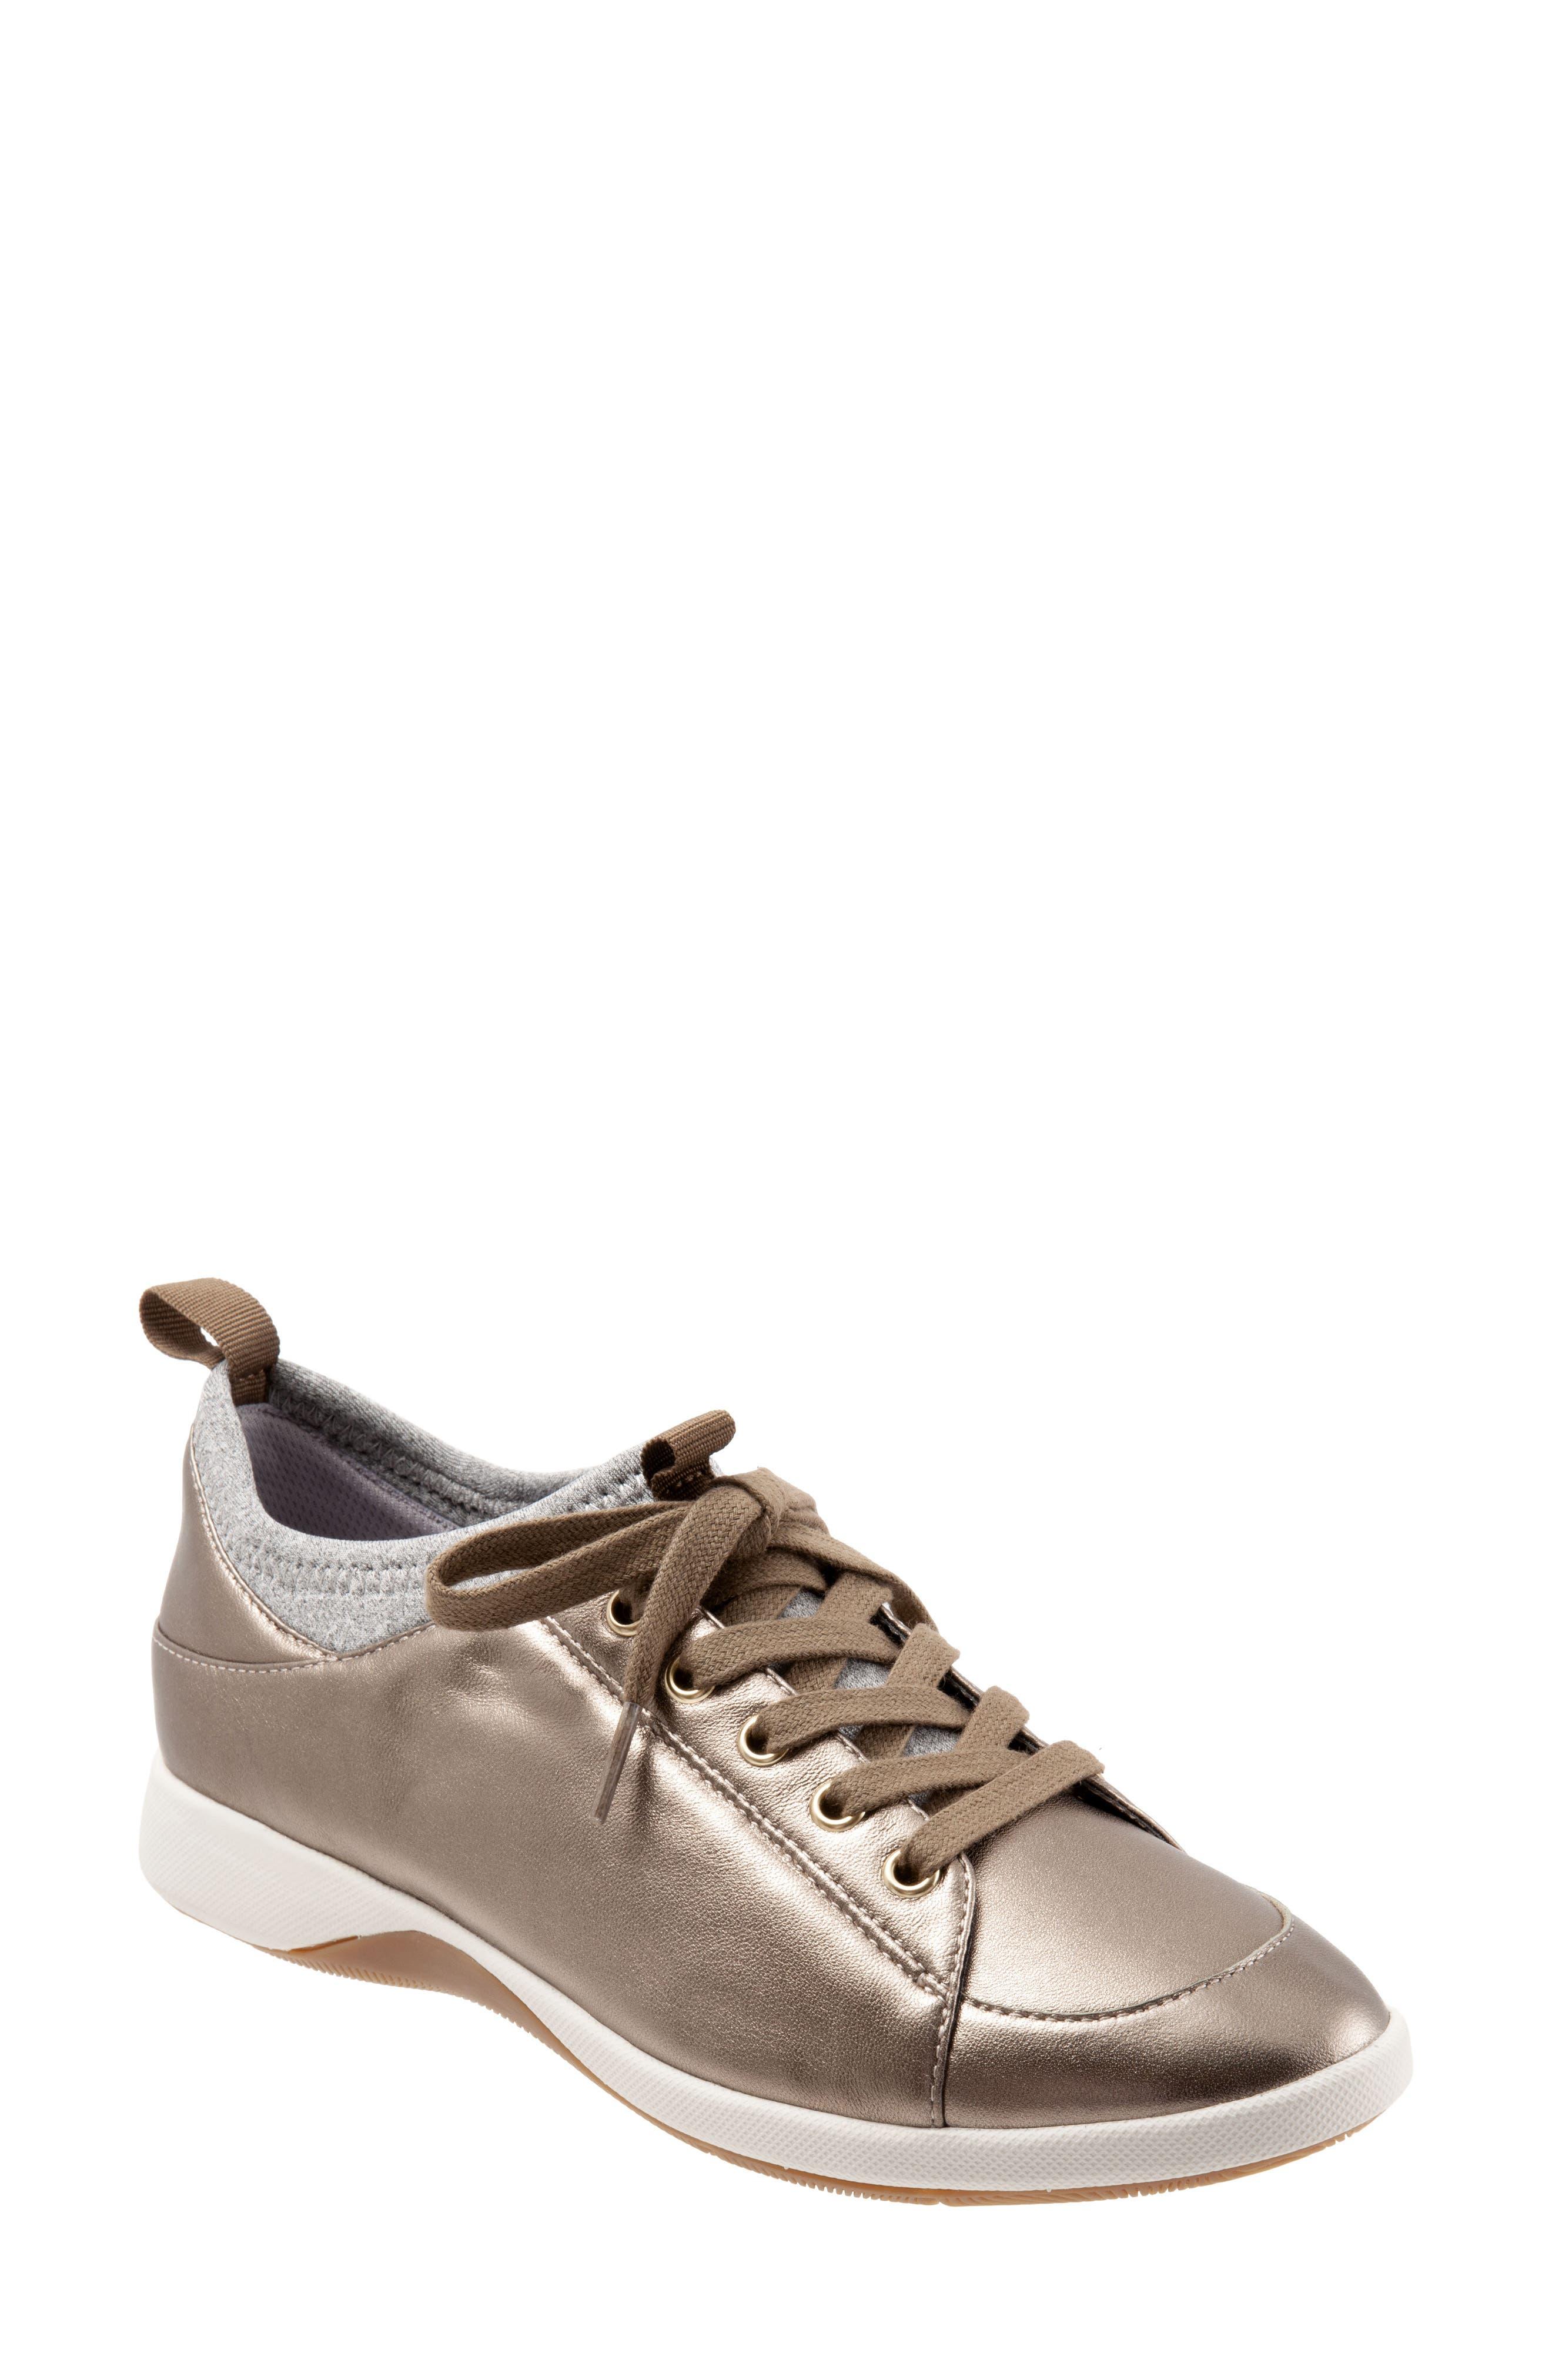 Softwalk Sava Haven Sneaker, W - Metallic